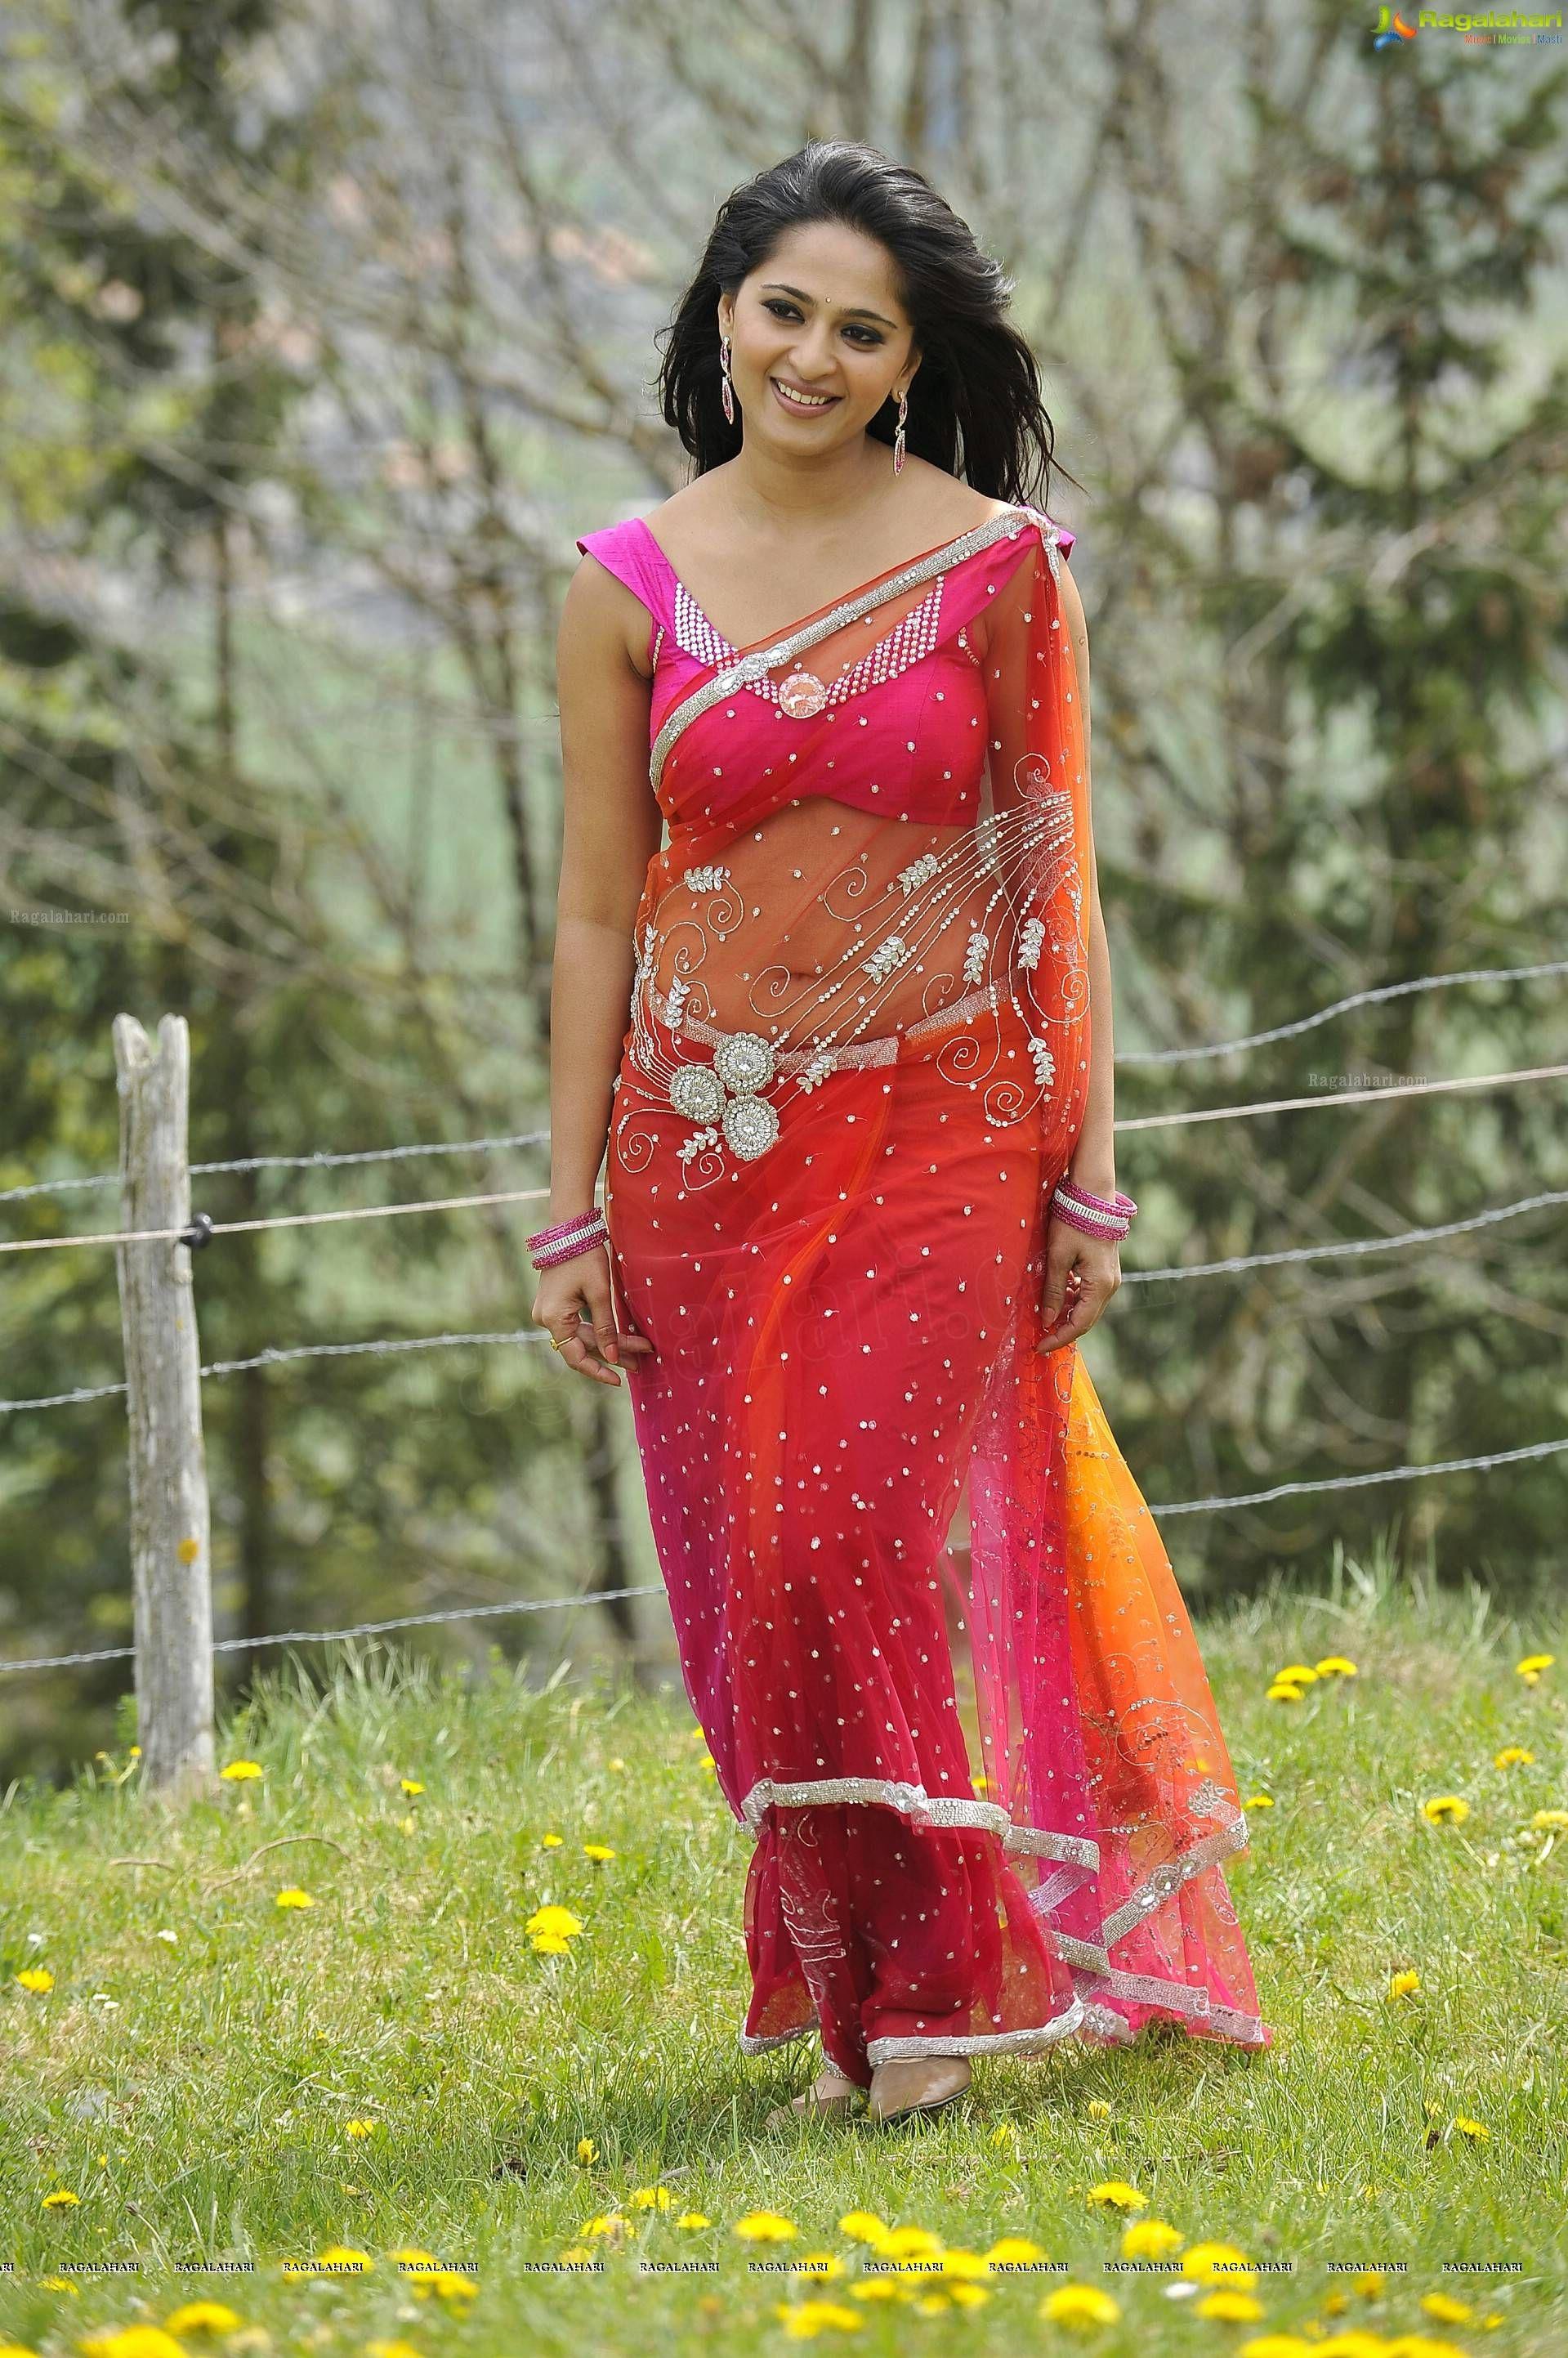 Anushka shetty anushka shetty hot stills pictures beautiful pictures - Anushka Hot Stills 1